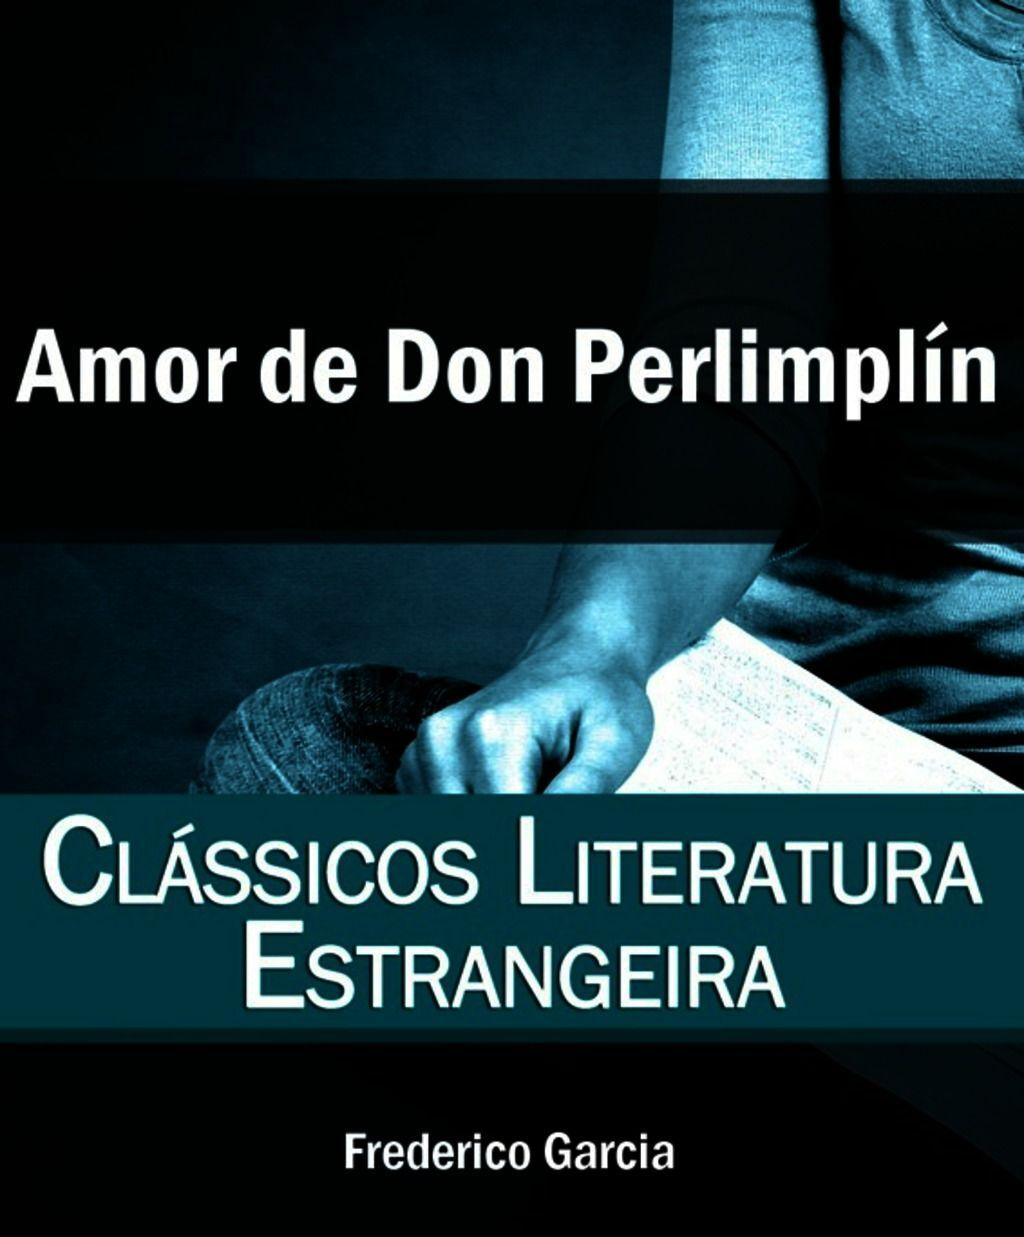 Amor de Don Perlimplin